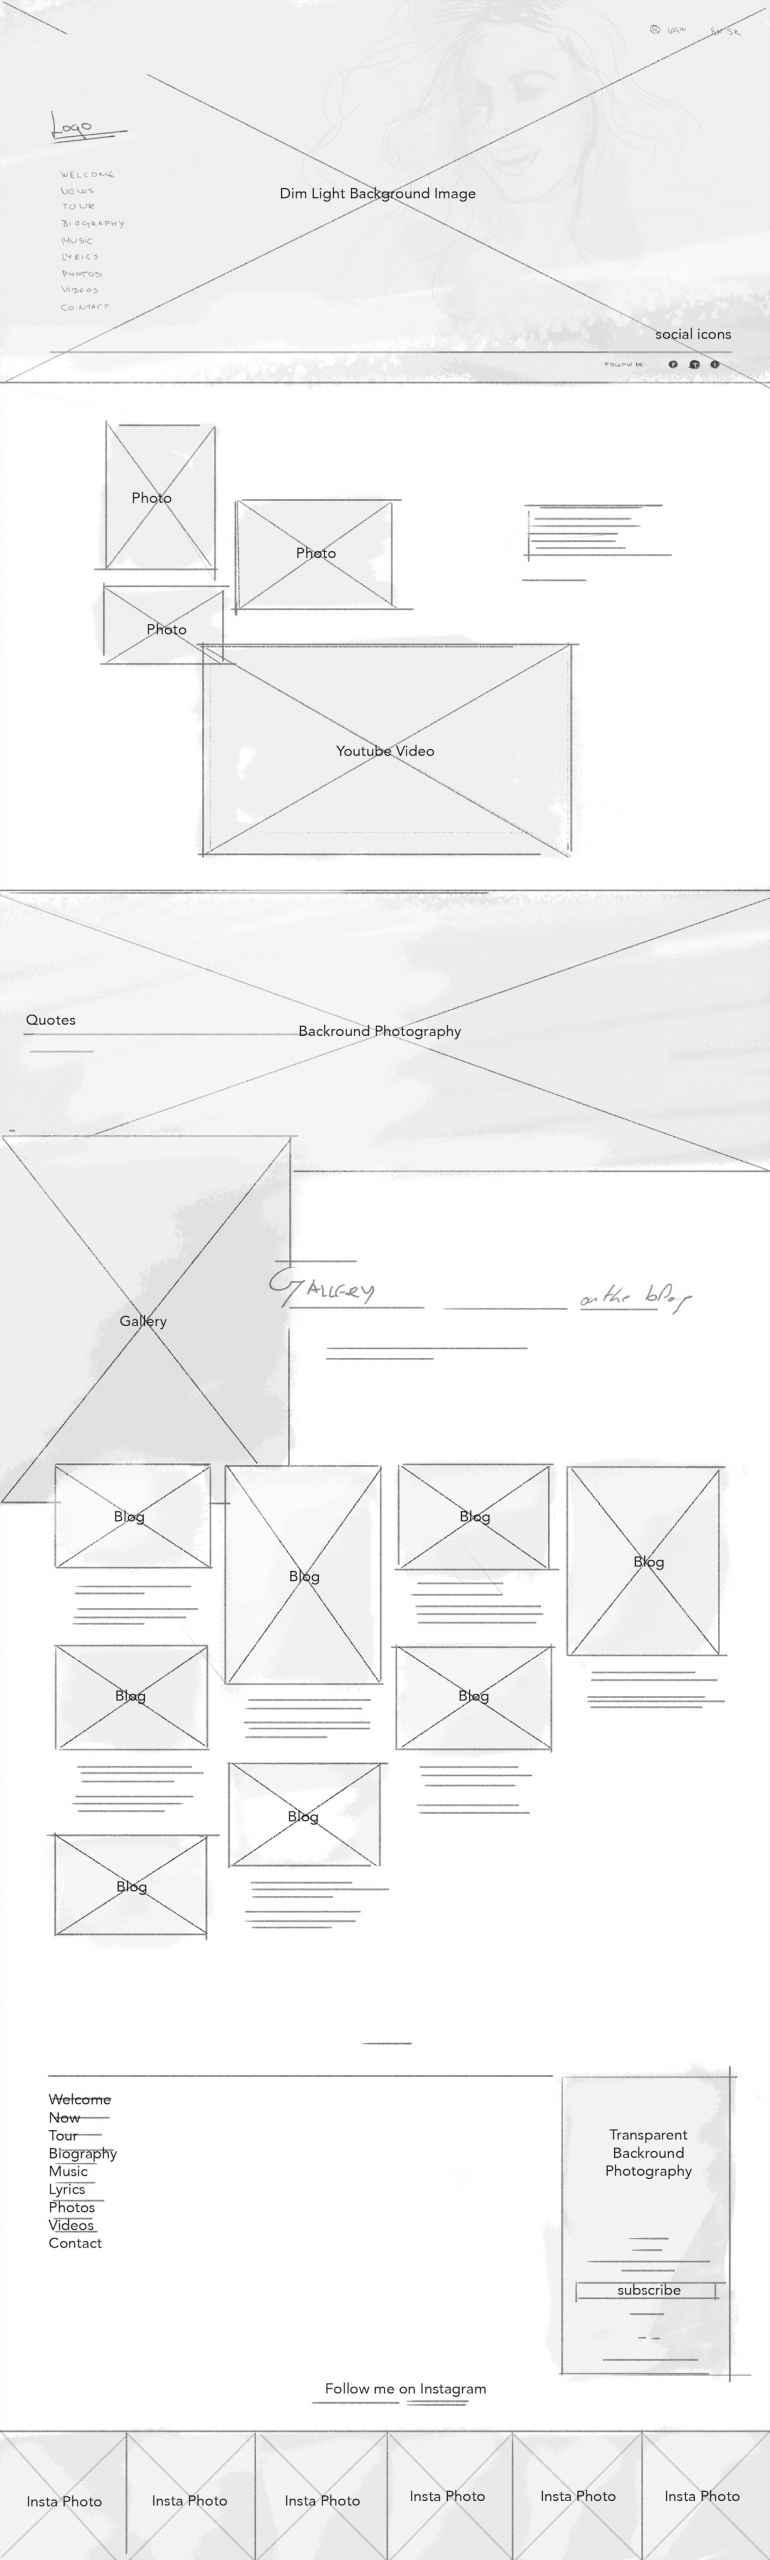 Maja Sar Web Design 2.jpg